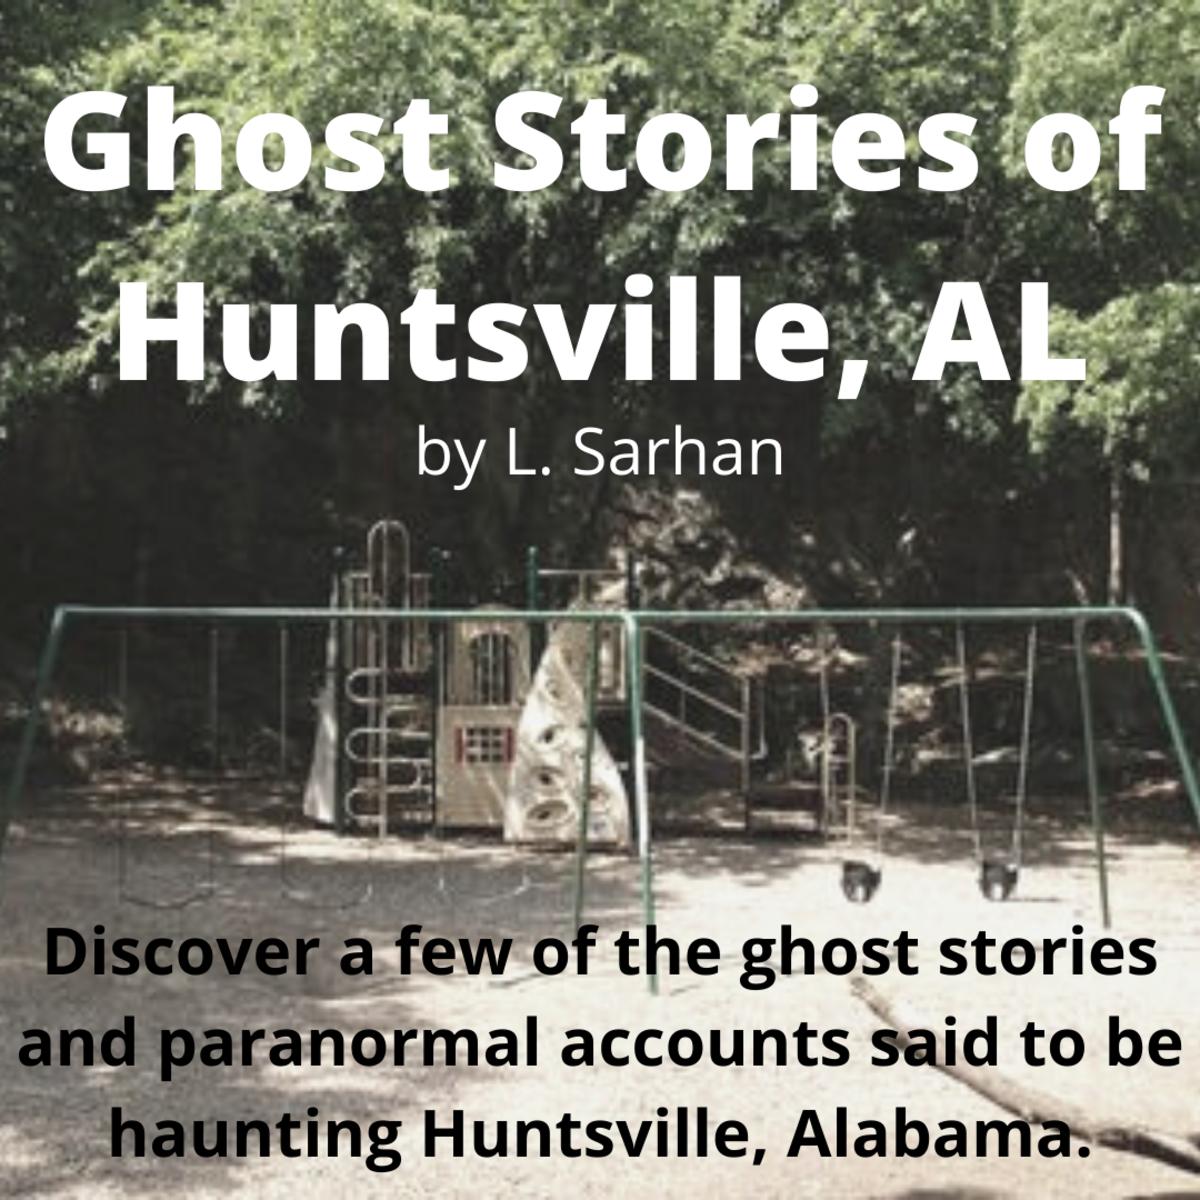 Ghost Stories of Huntsville, Alabama